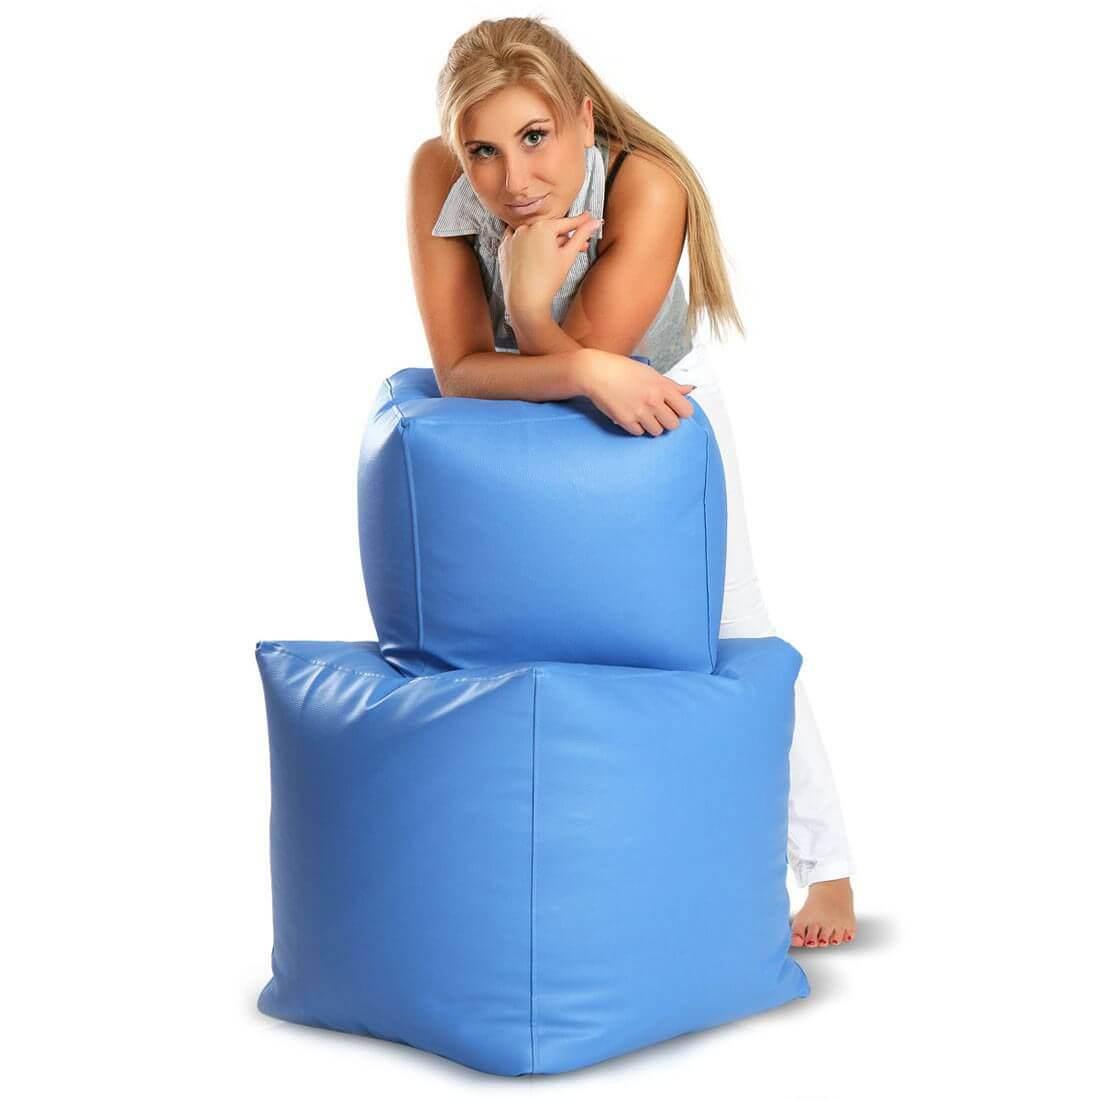 Cubes velký 50x50 cm modra